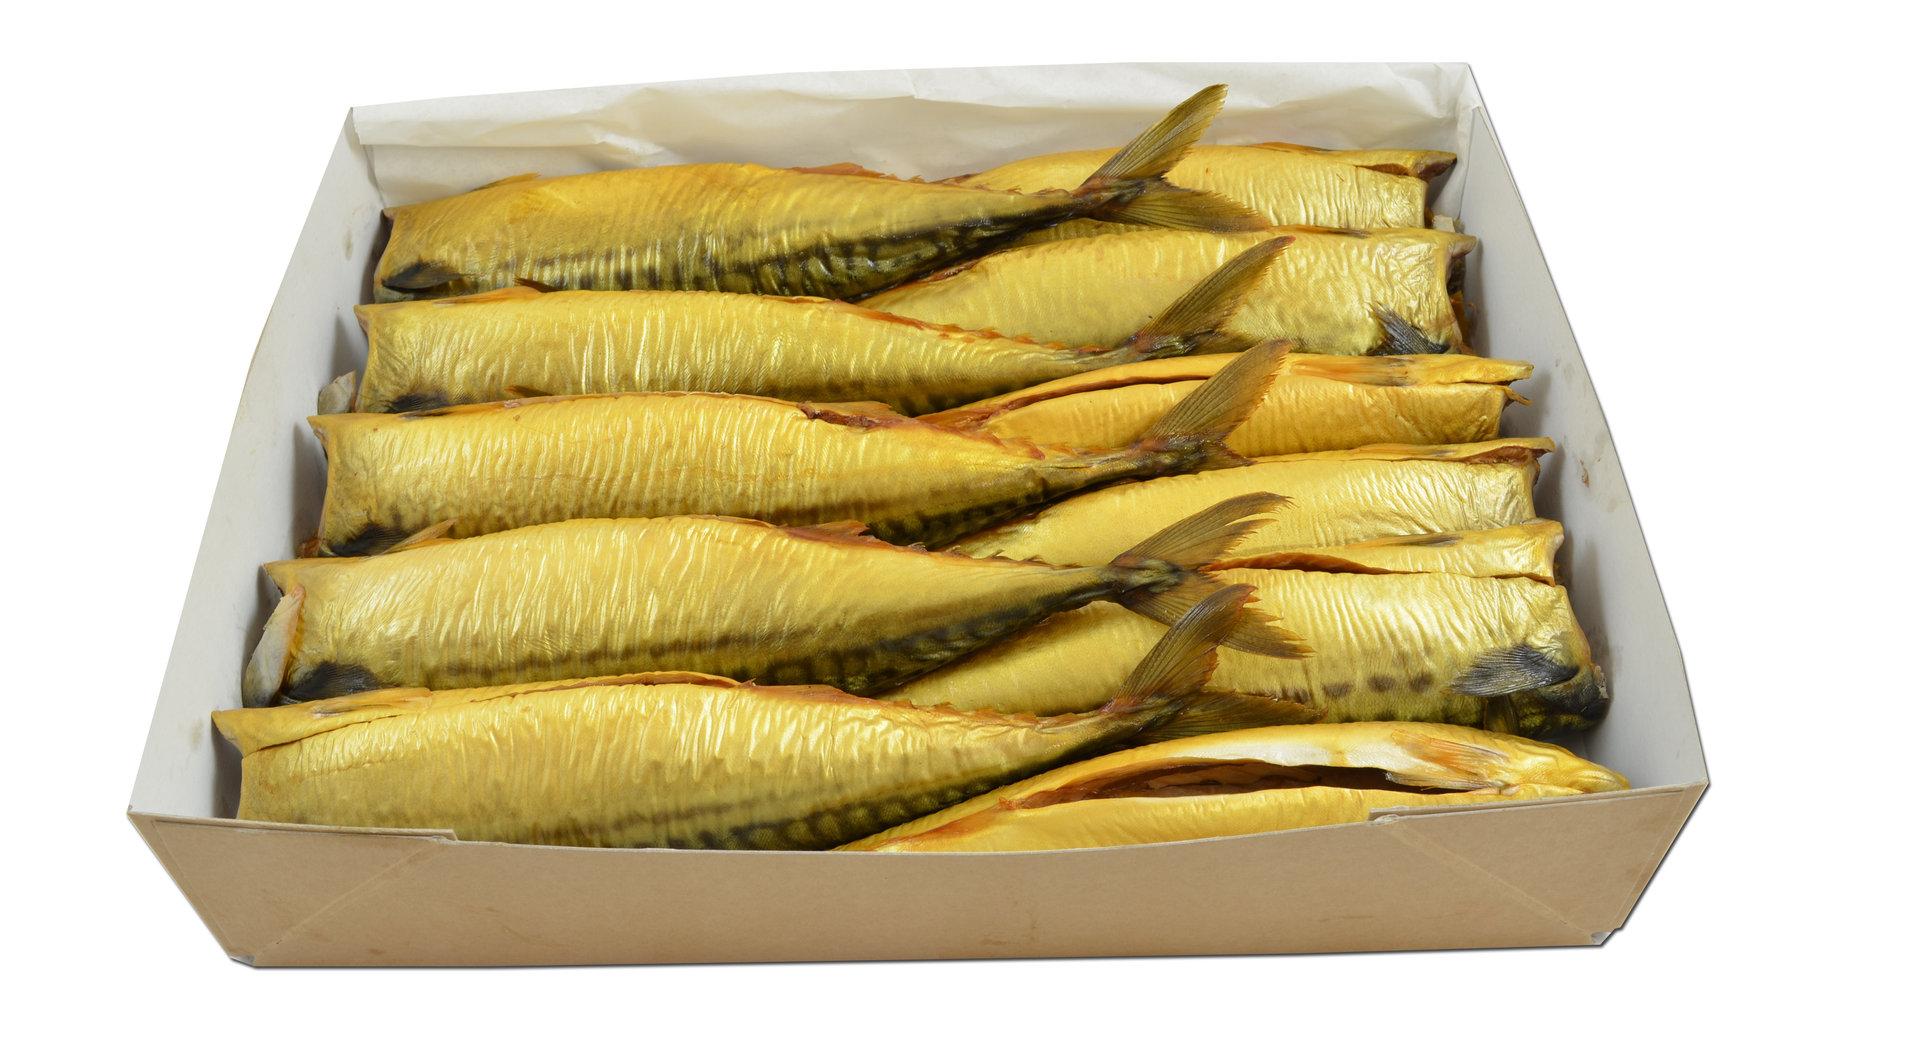 Makrelen ohne Kopf - L